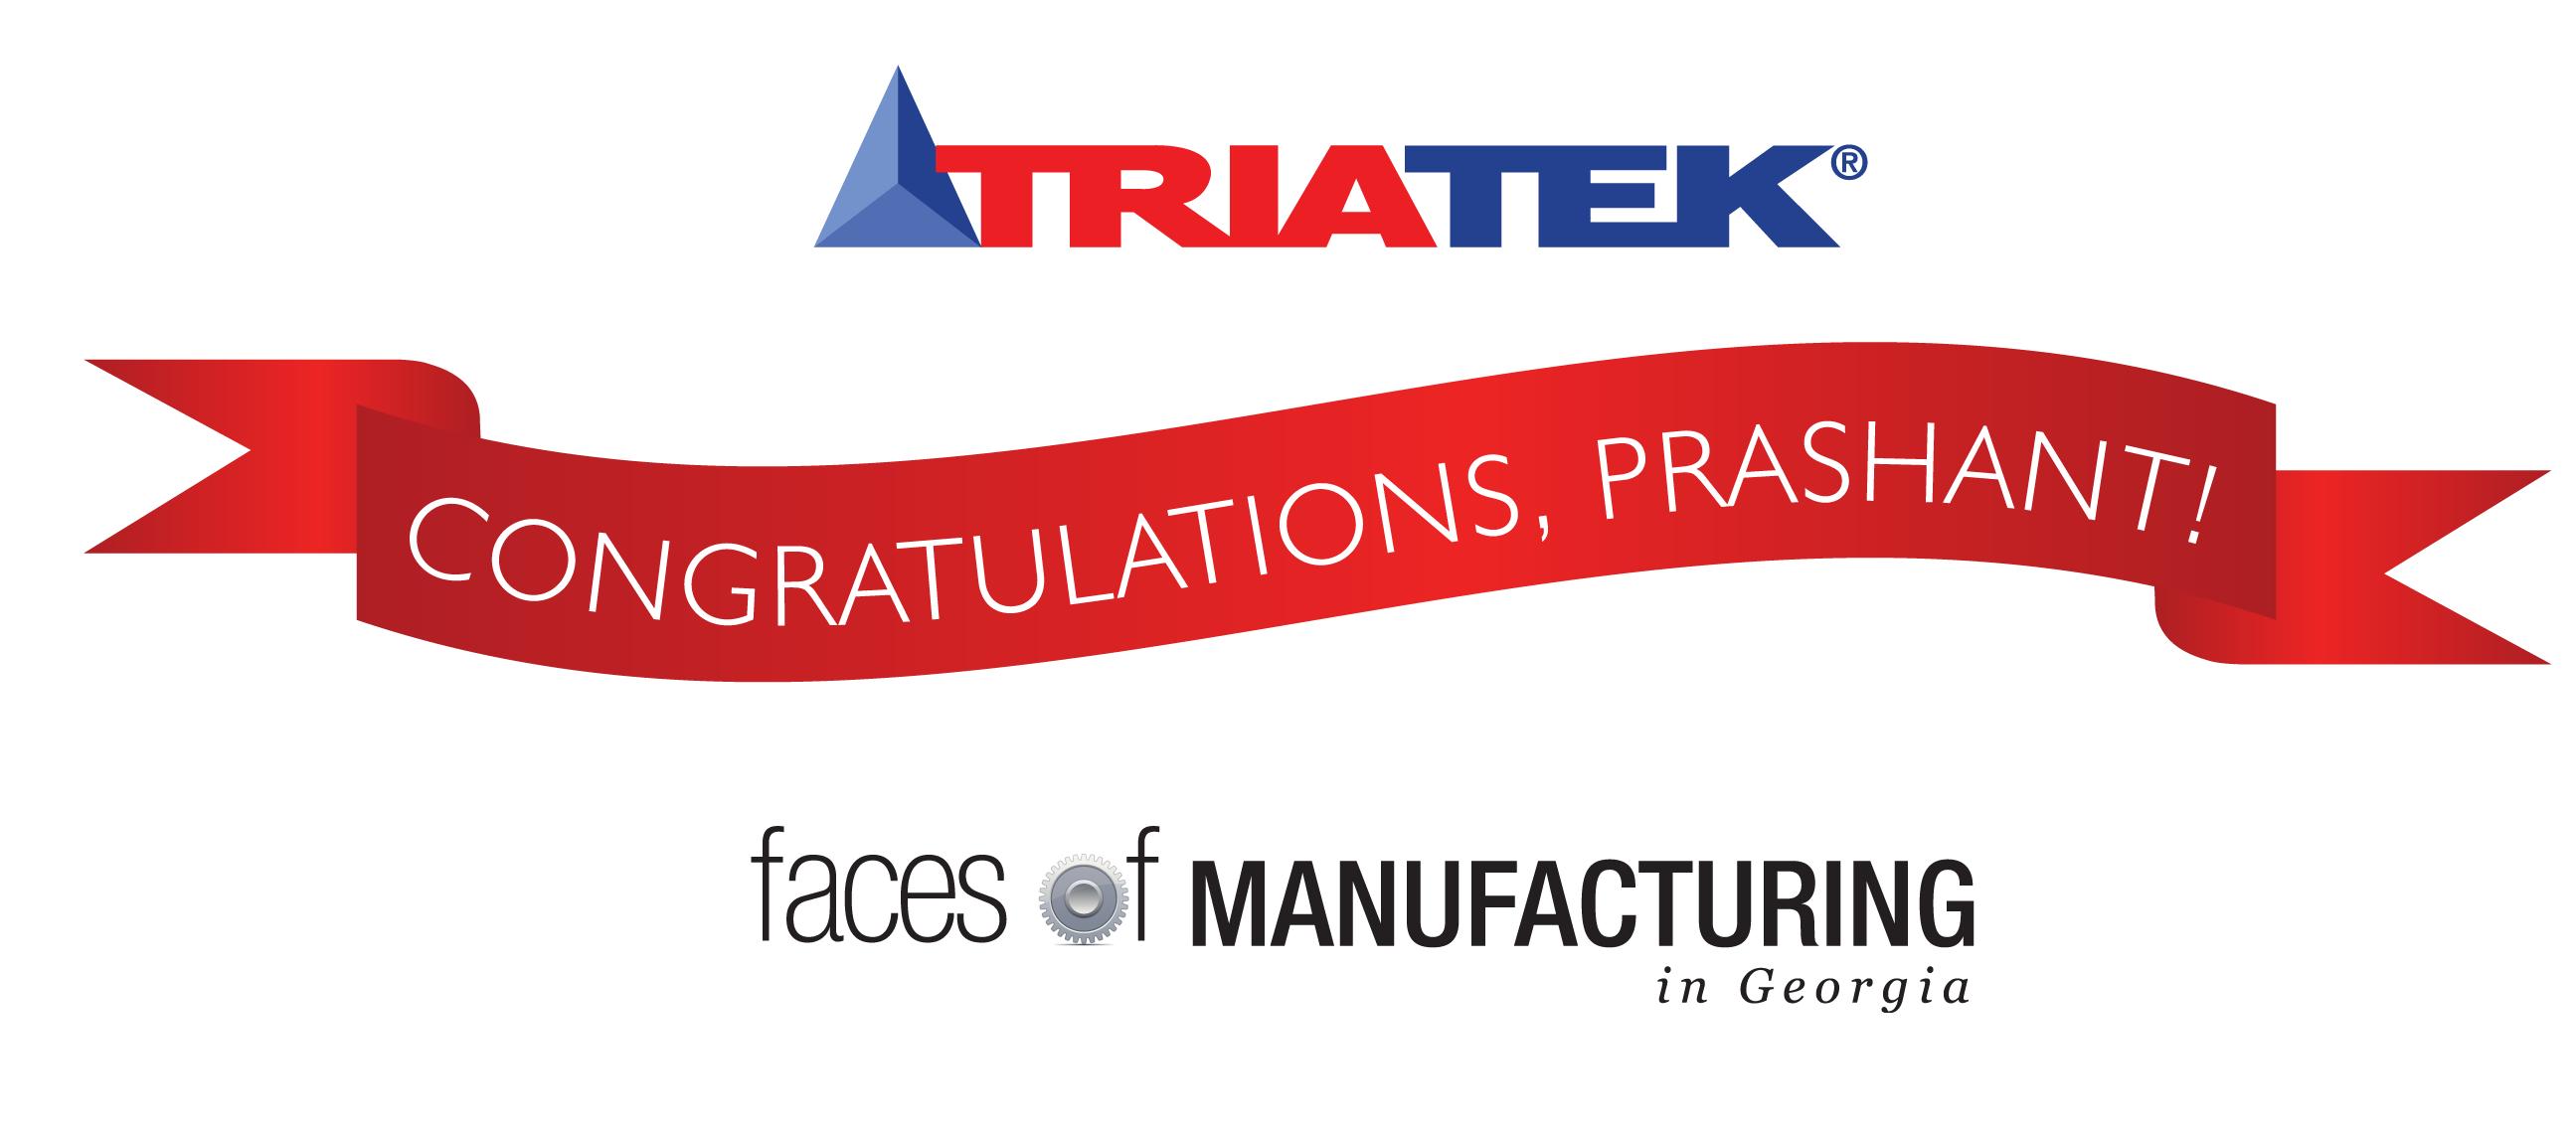 Congratulations Prashant!